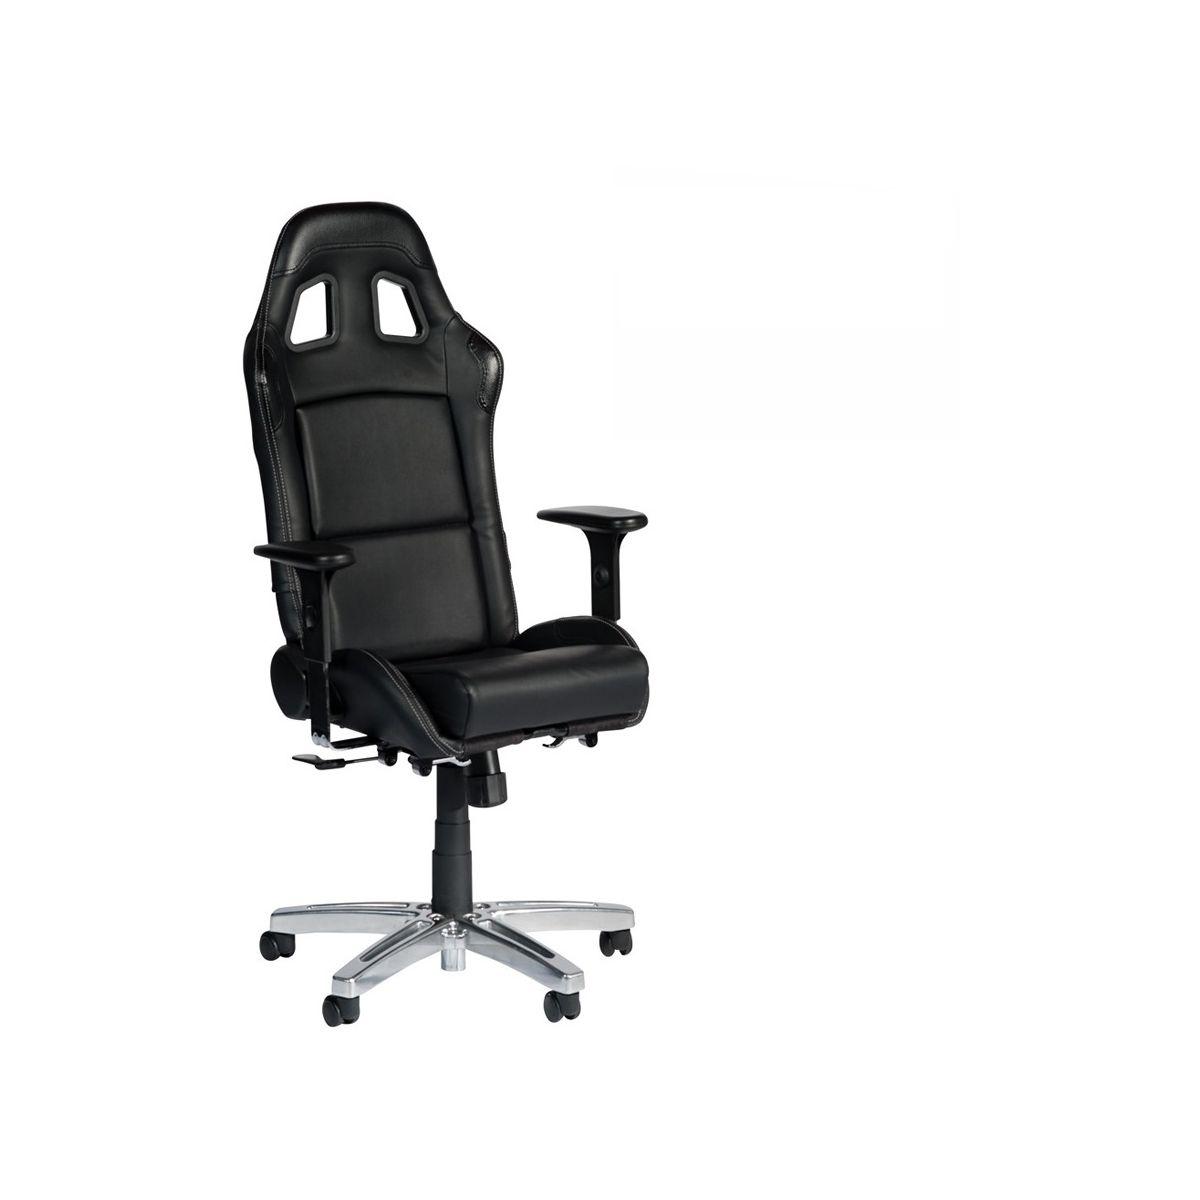 ACC. . Office Black (photo)